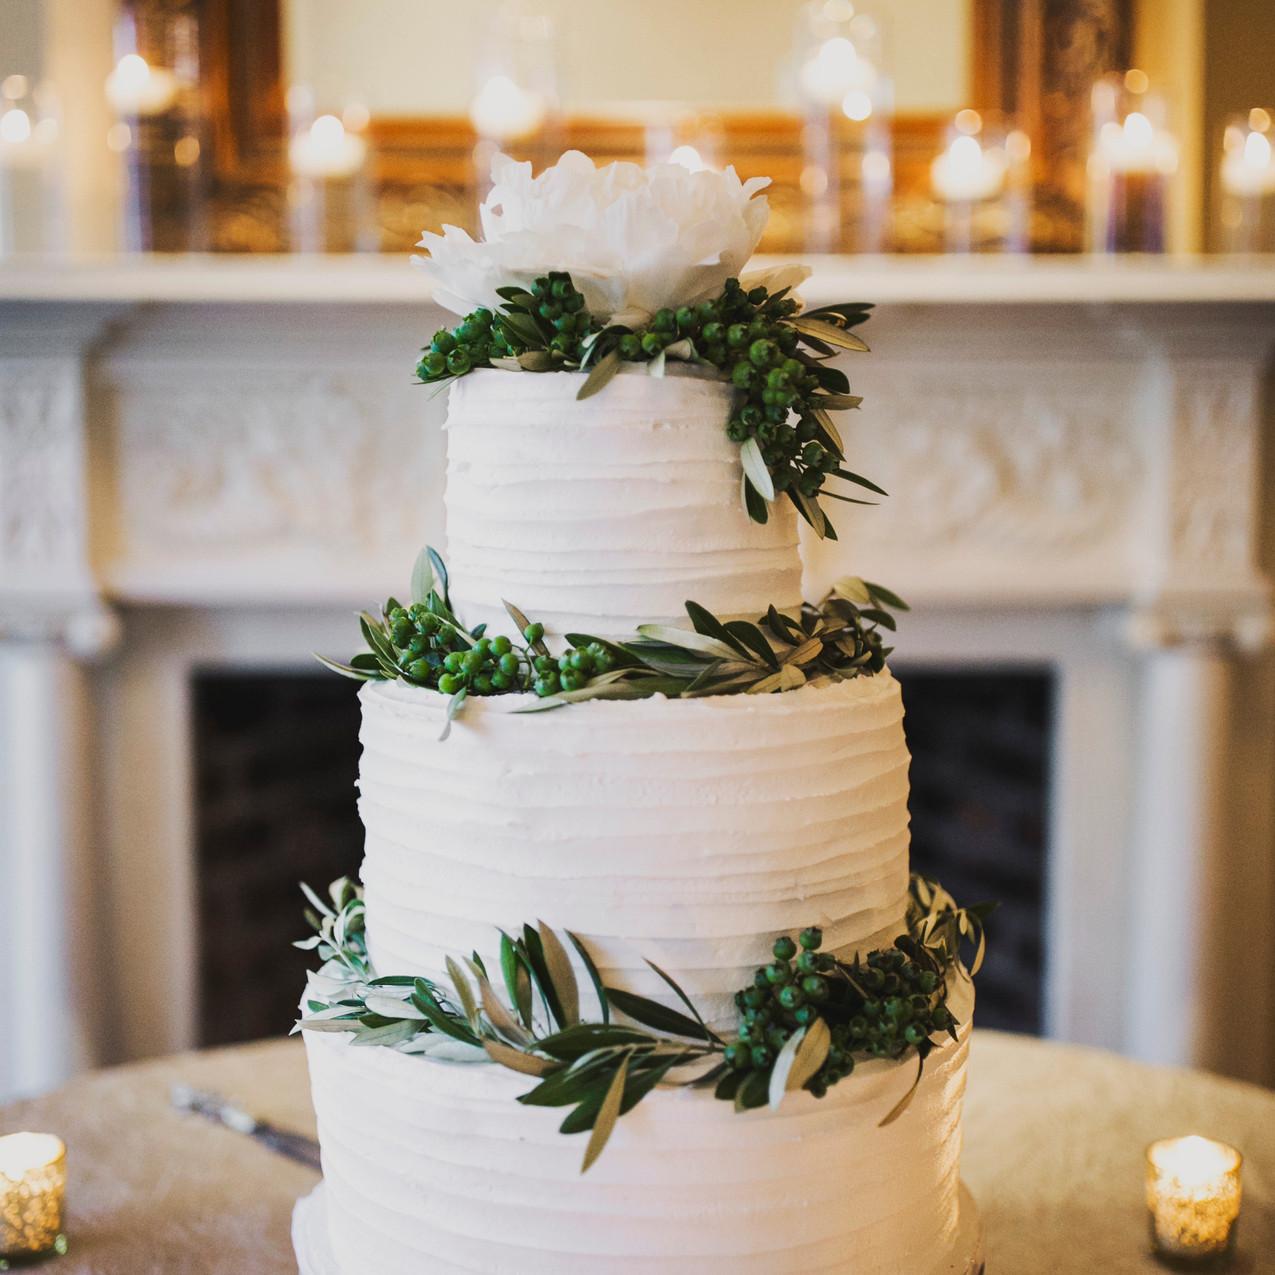 cb_wedding-details-351